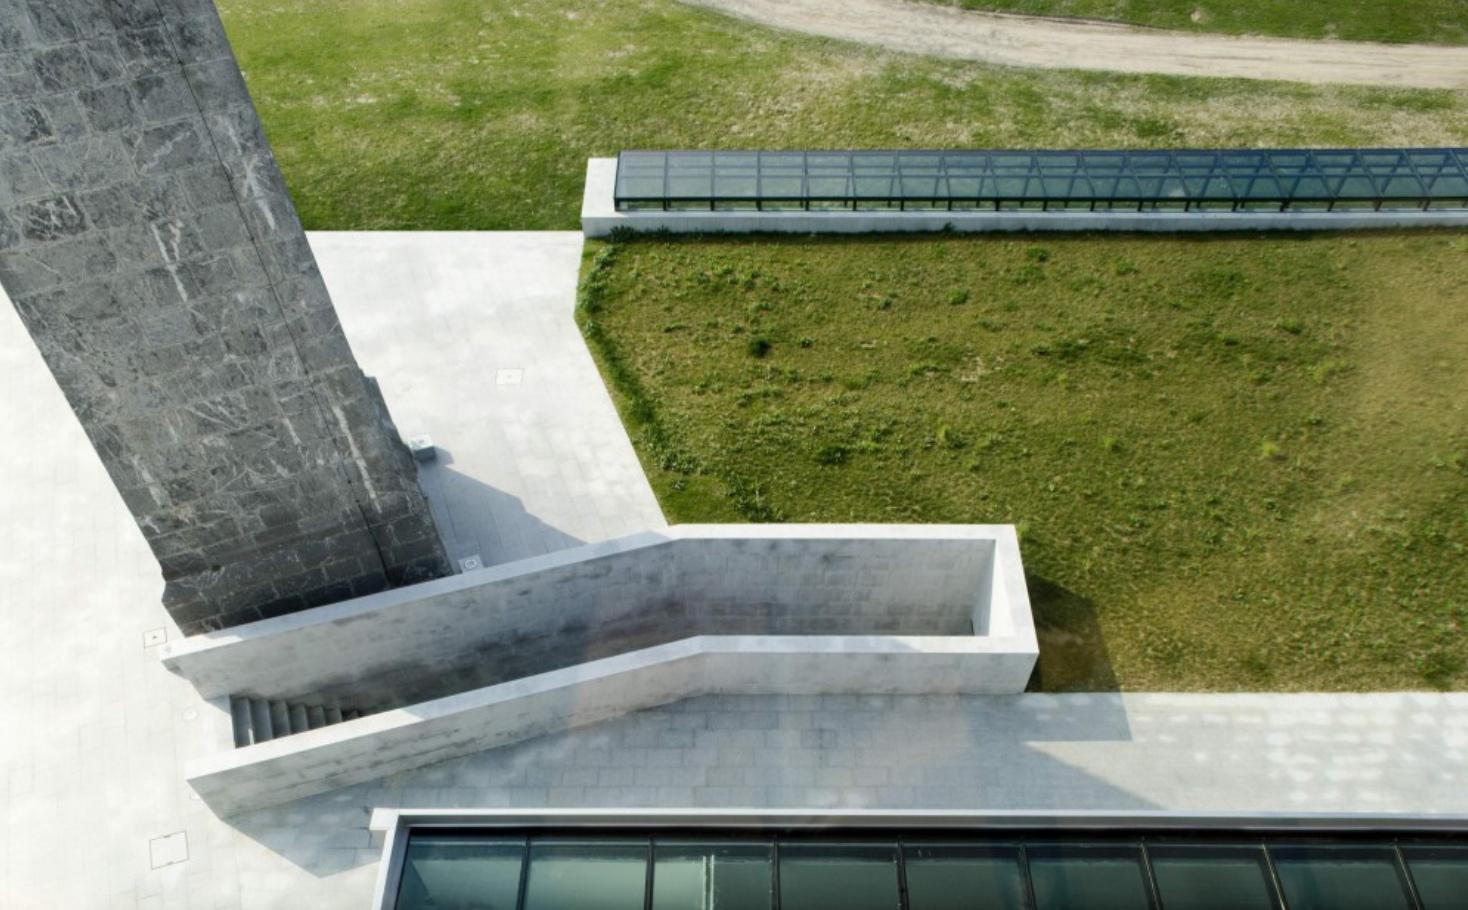 foto Aiotor Ortiz via plataforma arquitectura II